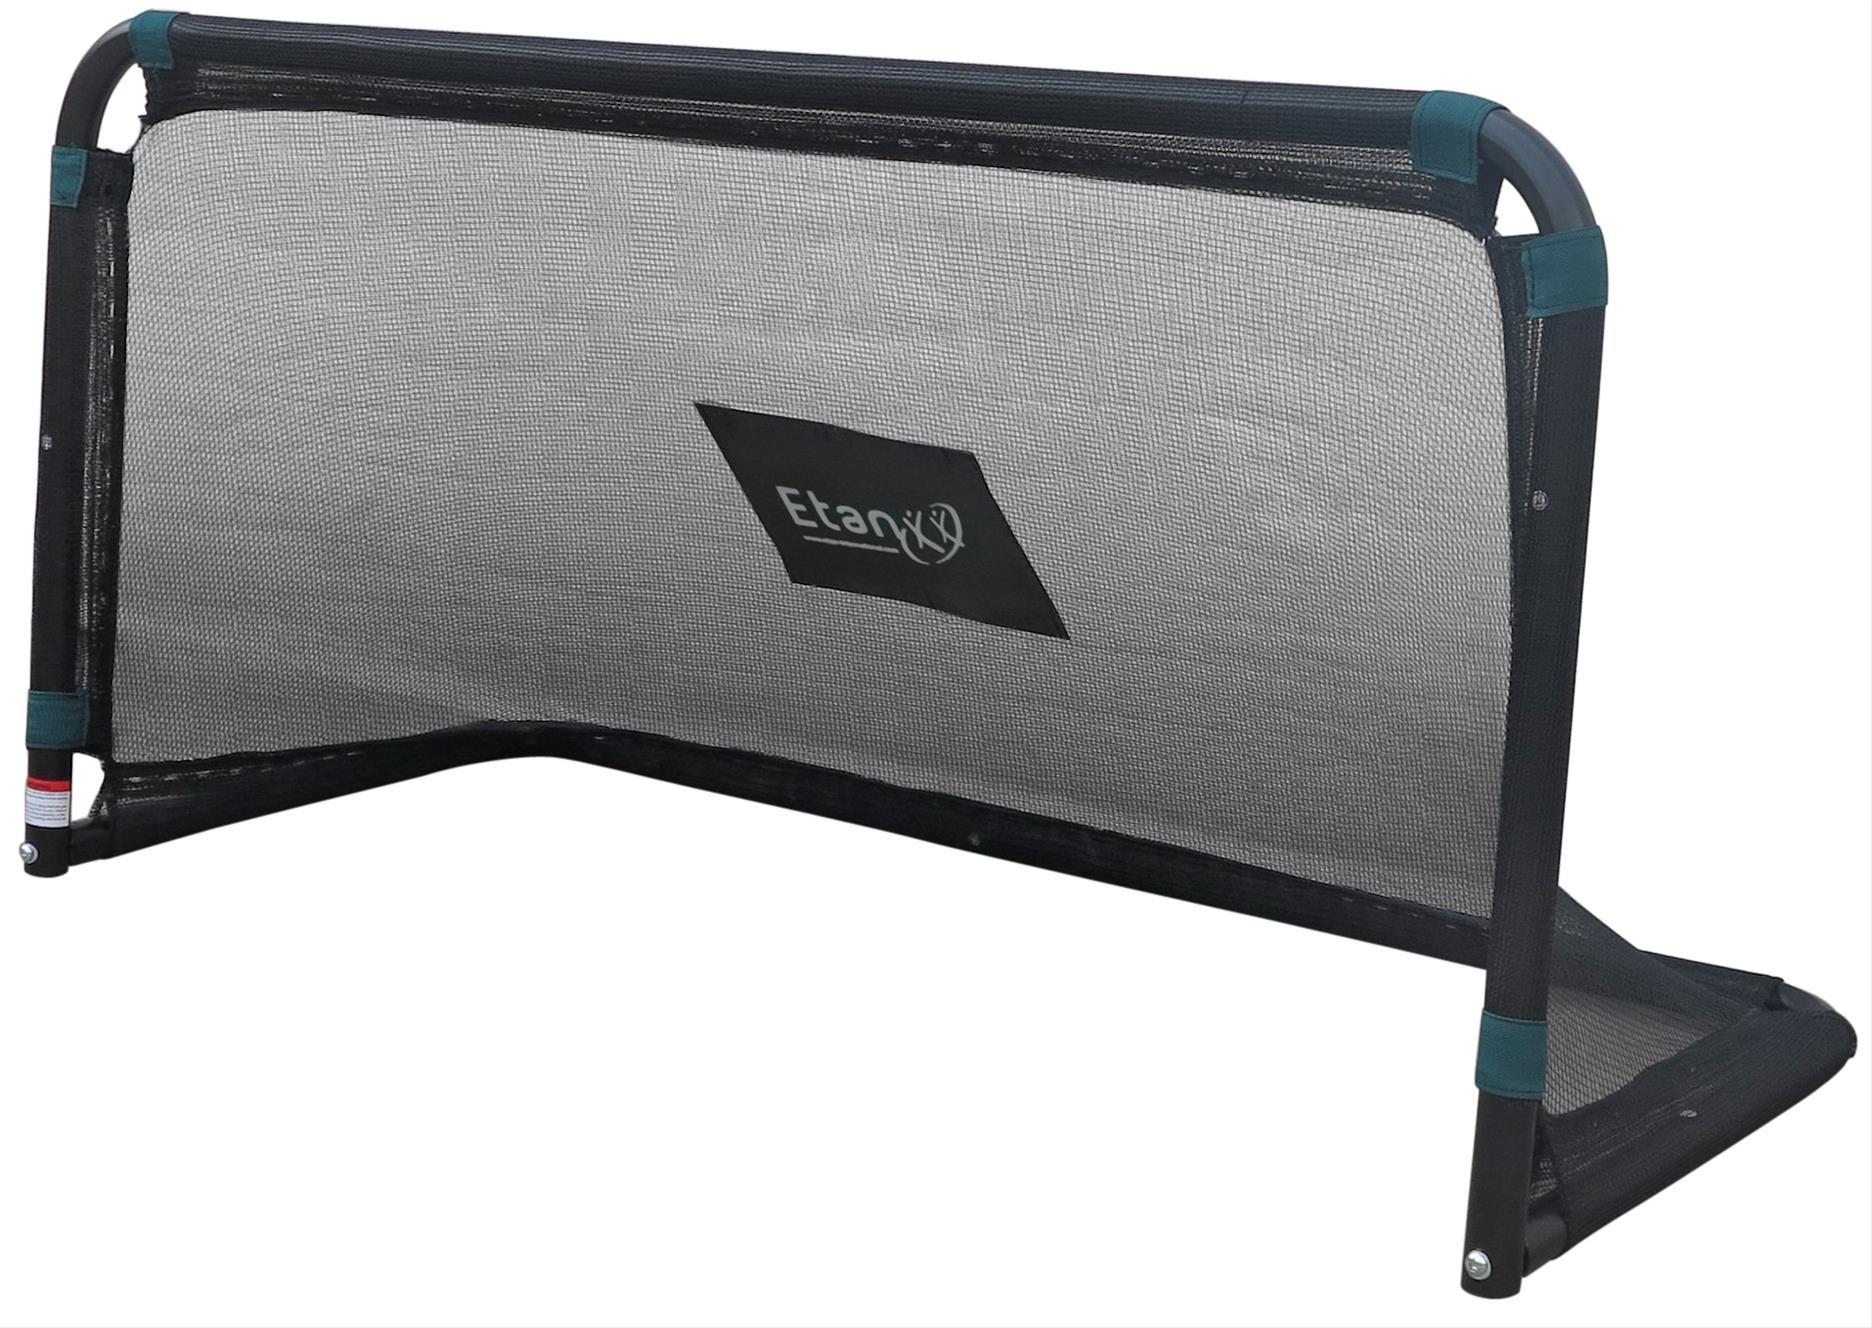 Fußballtor Etan mini Stahl schwarz 150x75x60cm Bild 1